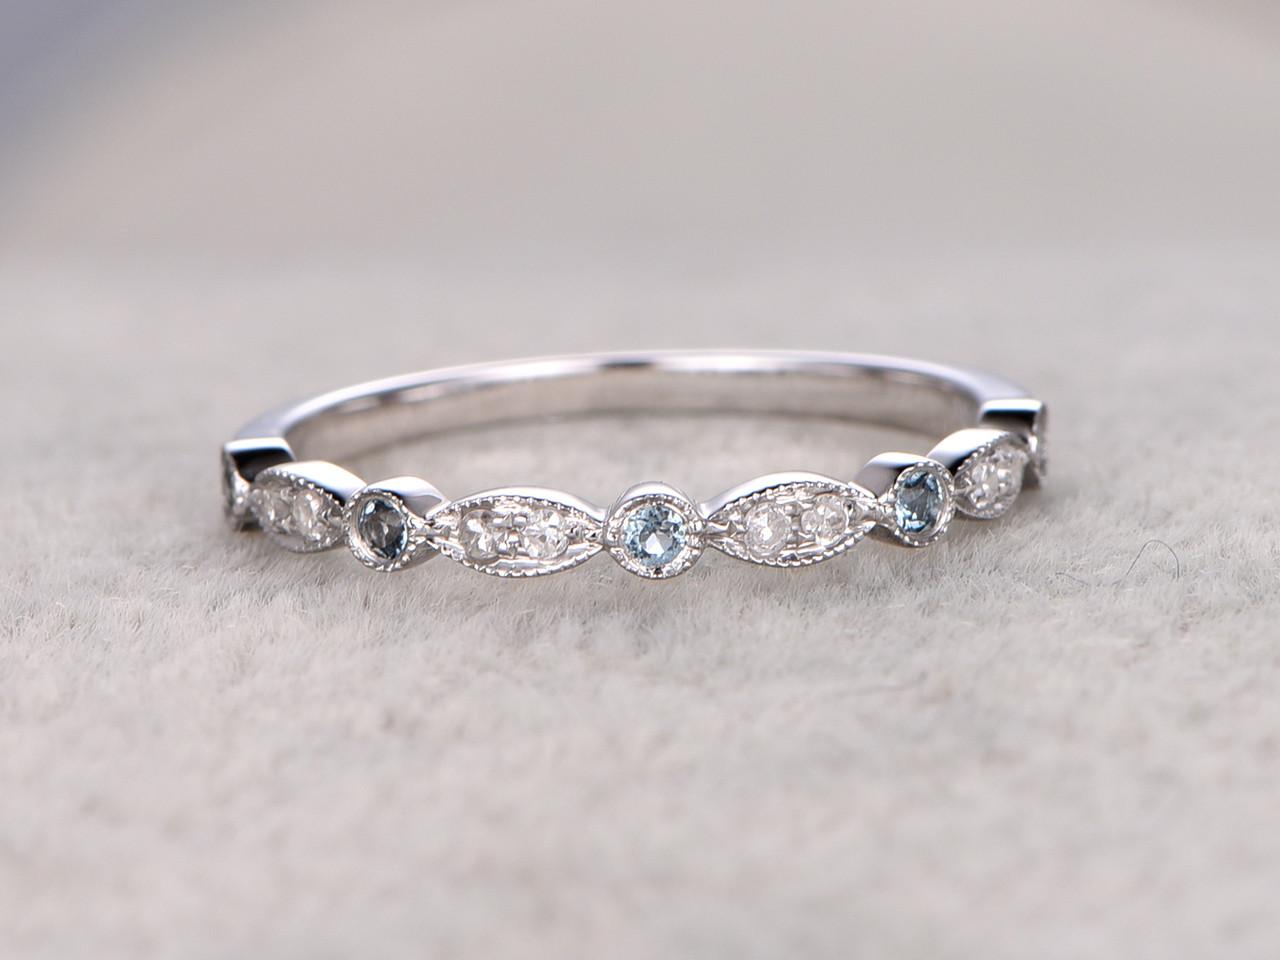 Blue Topaz and Diamond Wedding Rings 14k White Gold Antique Art Deco